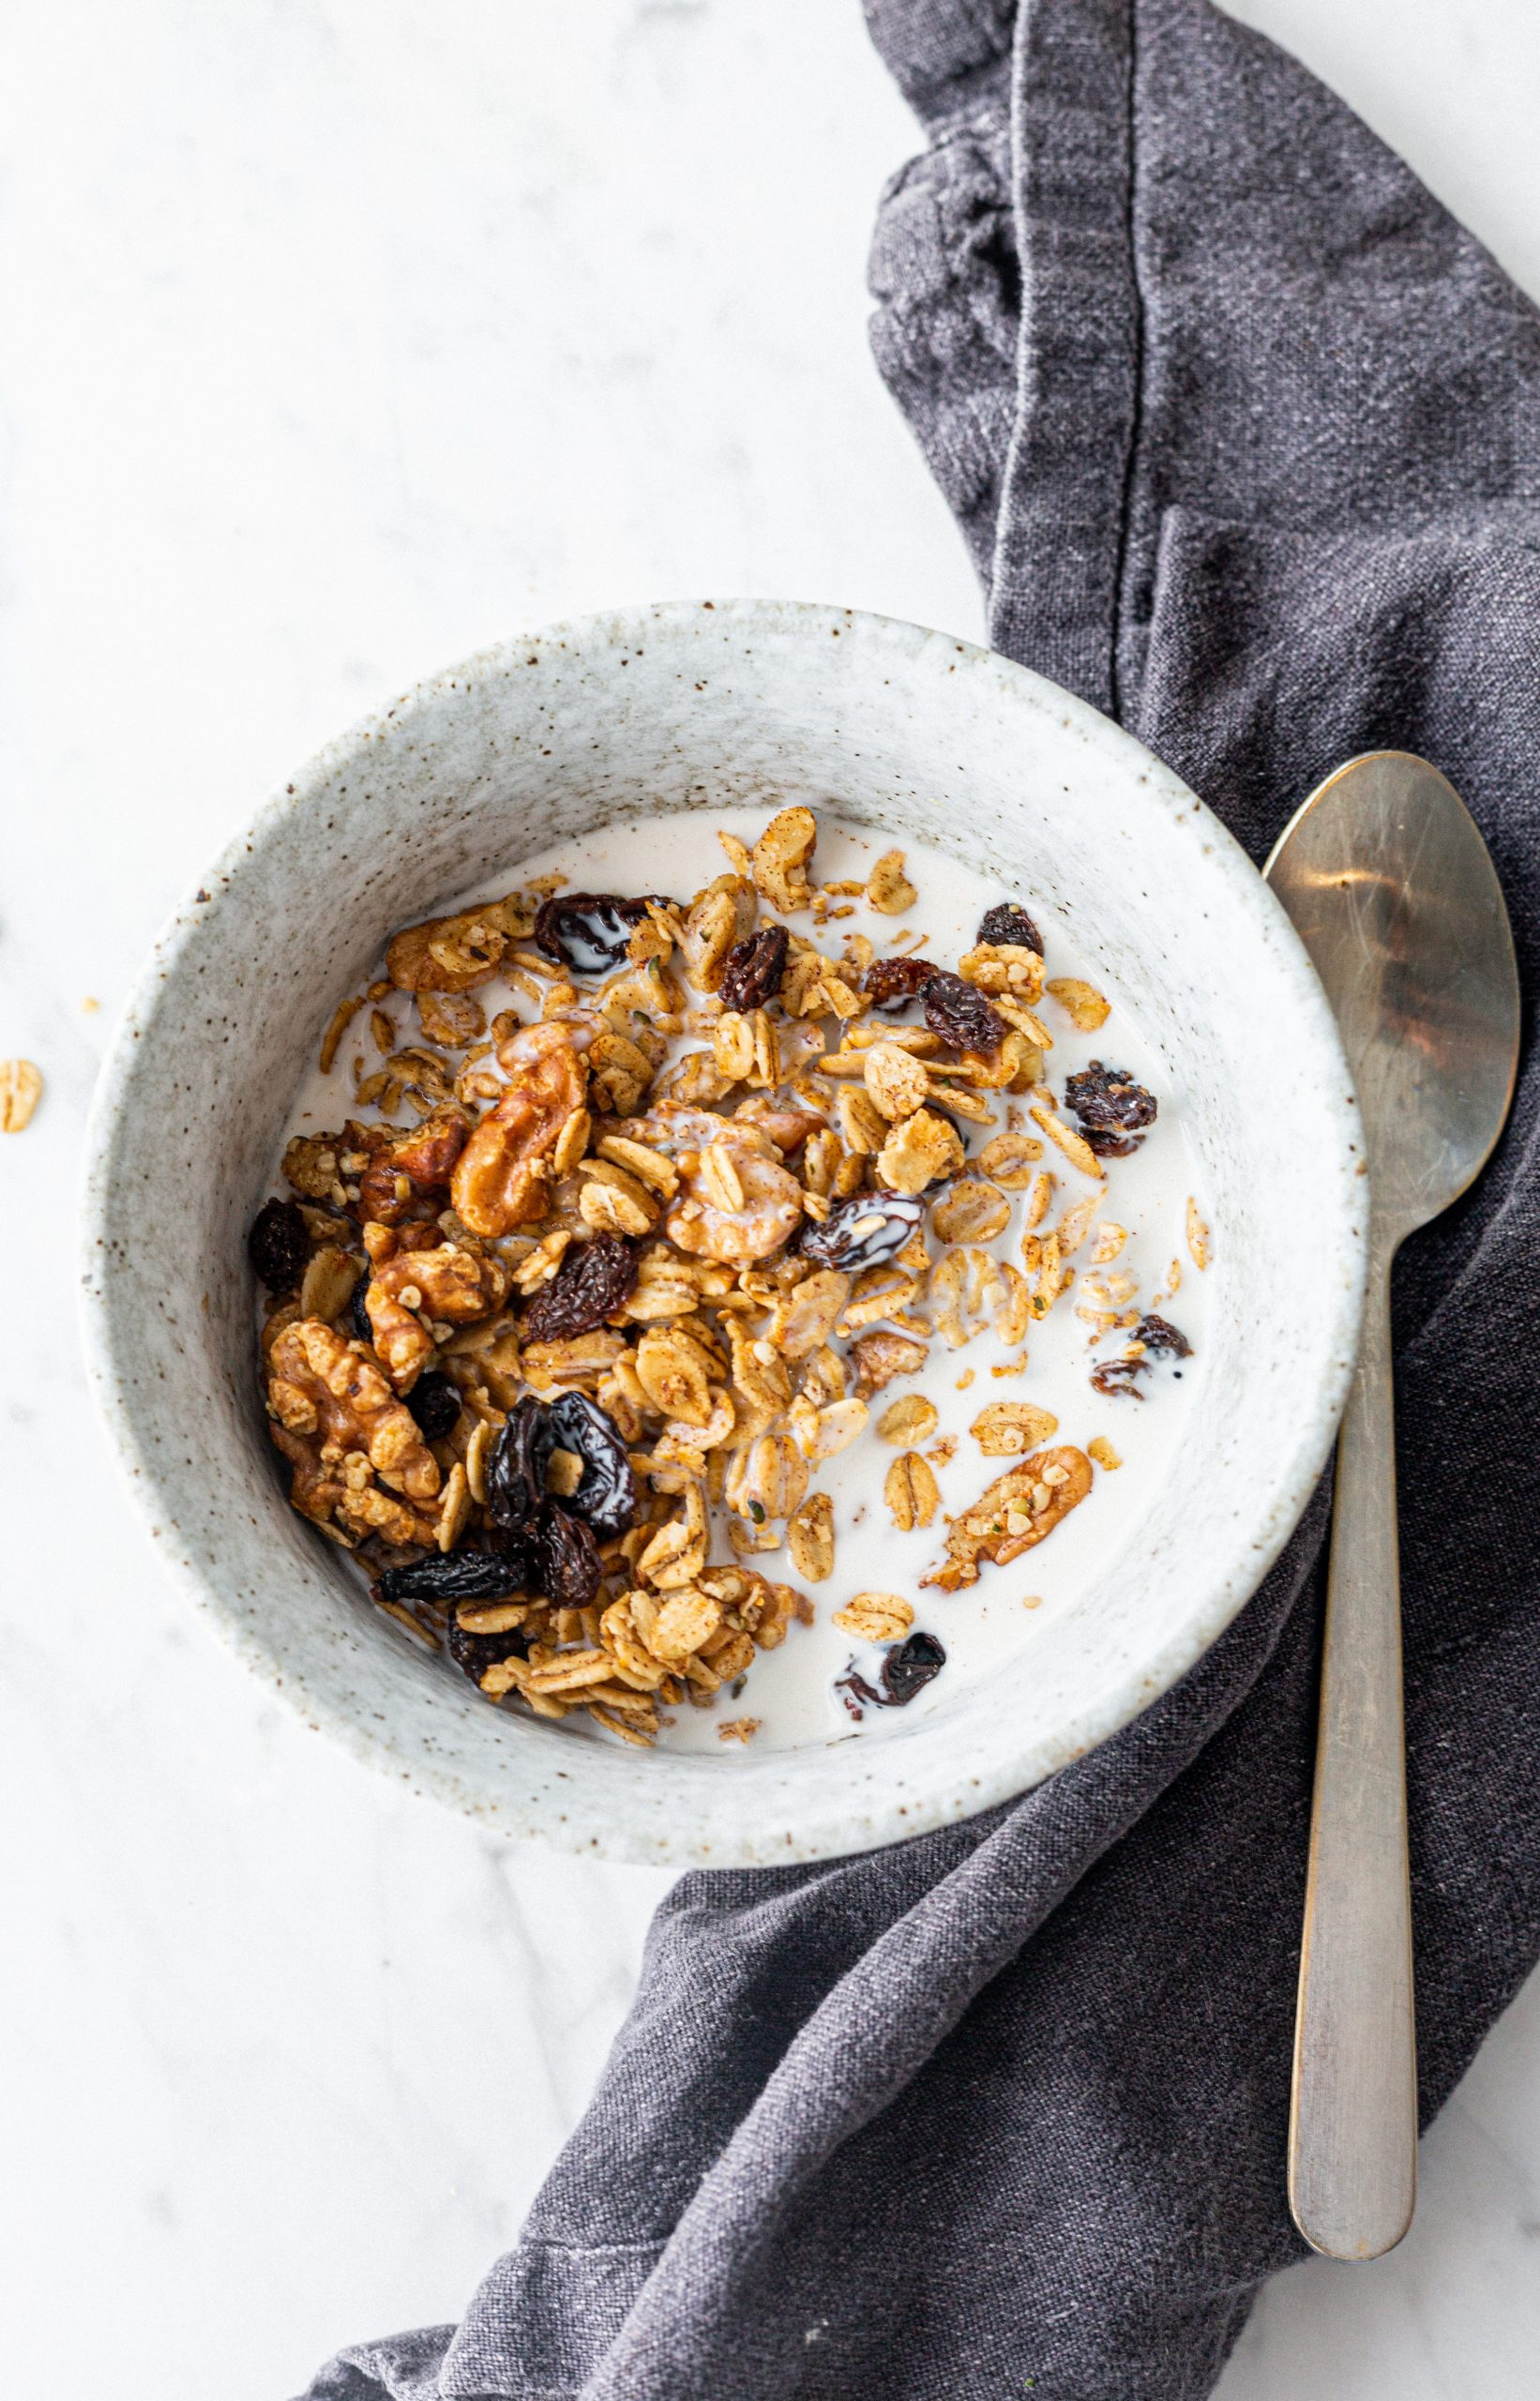 pumpkin spice gluten-free granola with raisins and walnuts